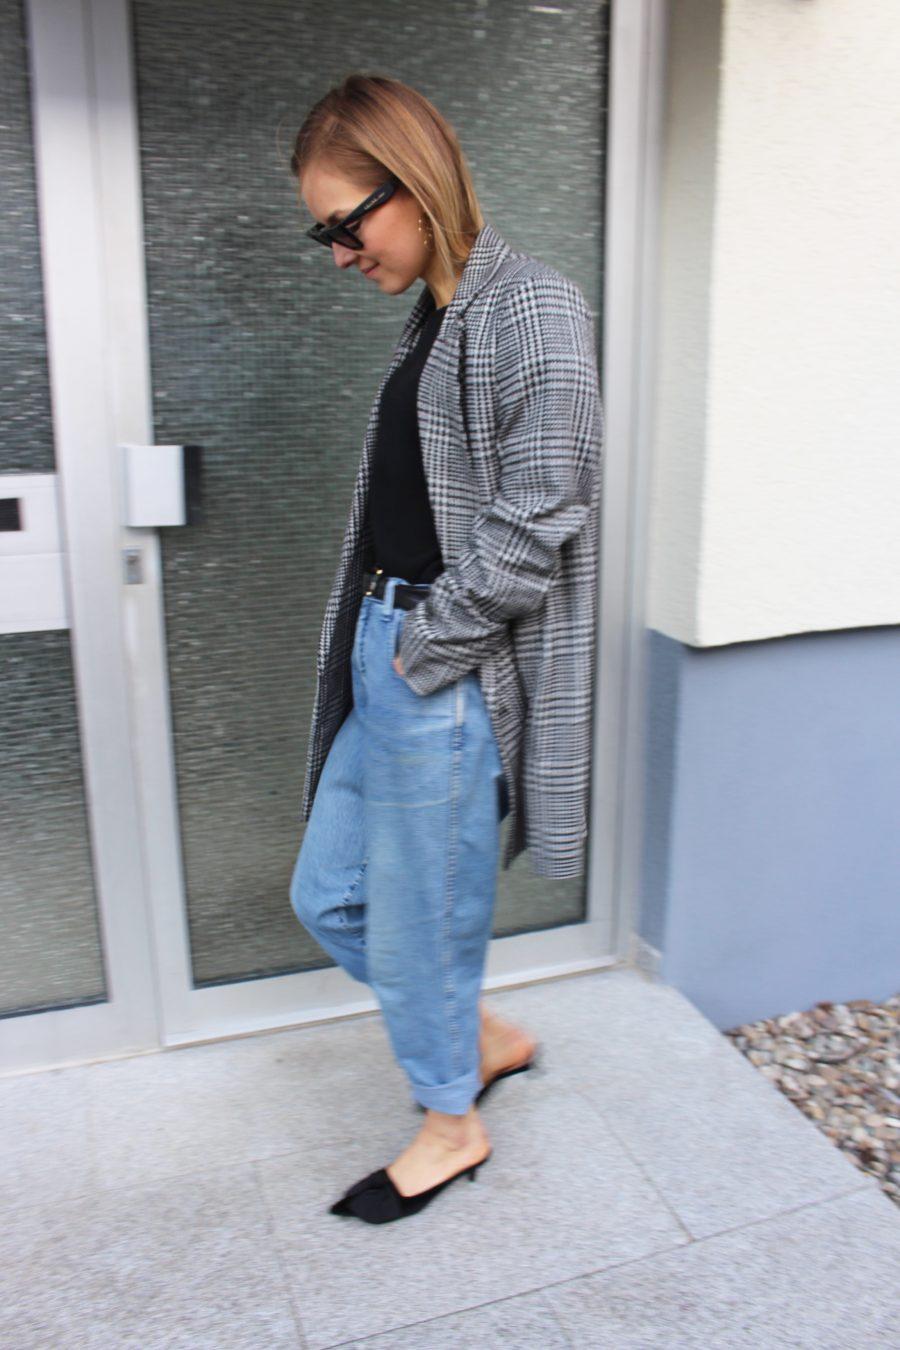 vintag earmani jeans